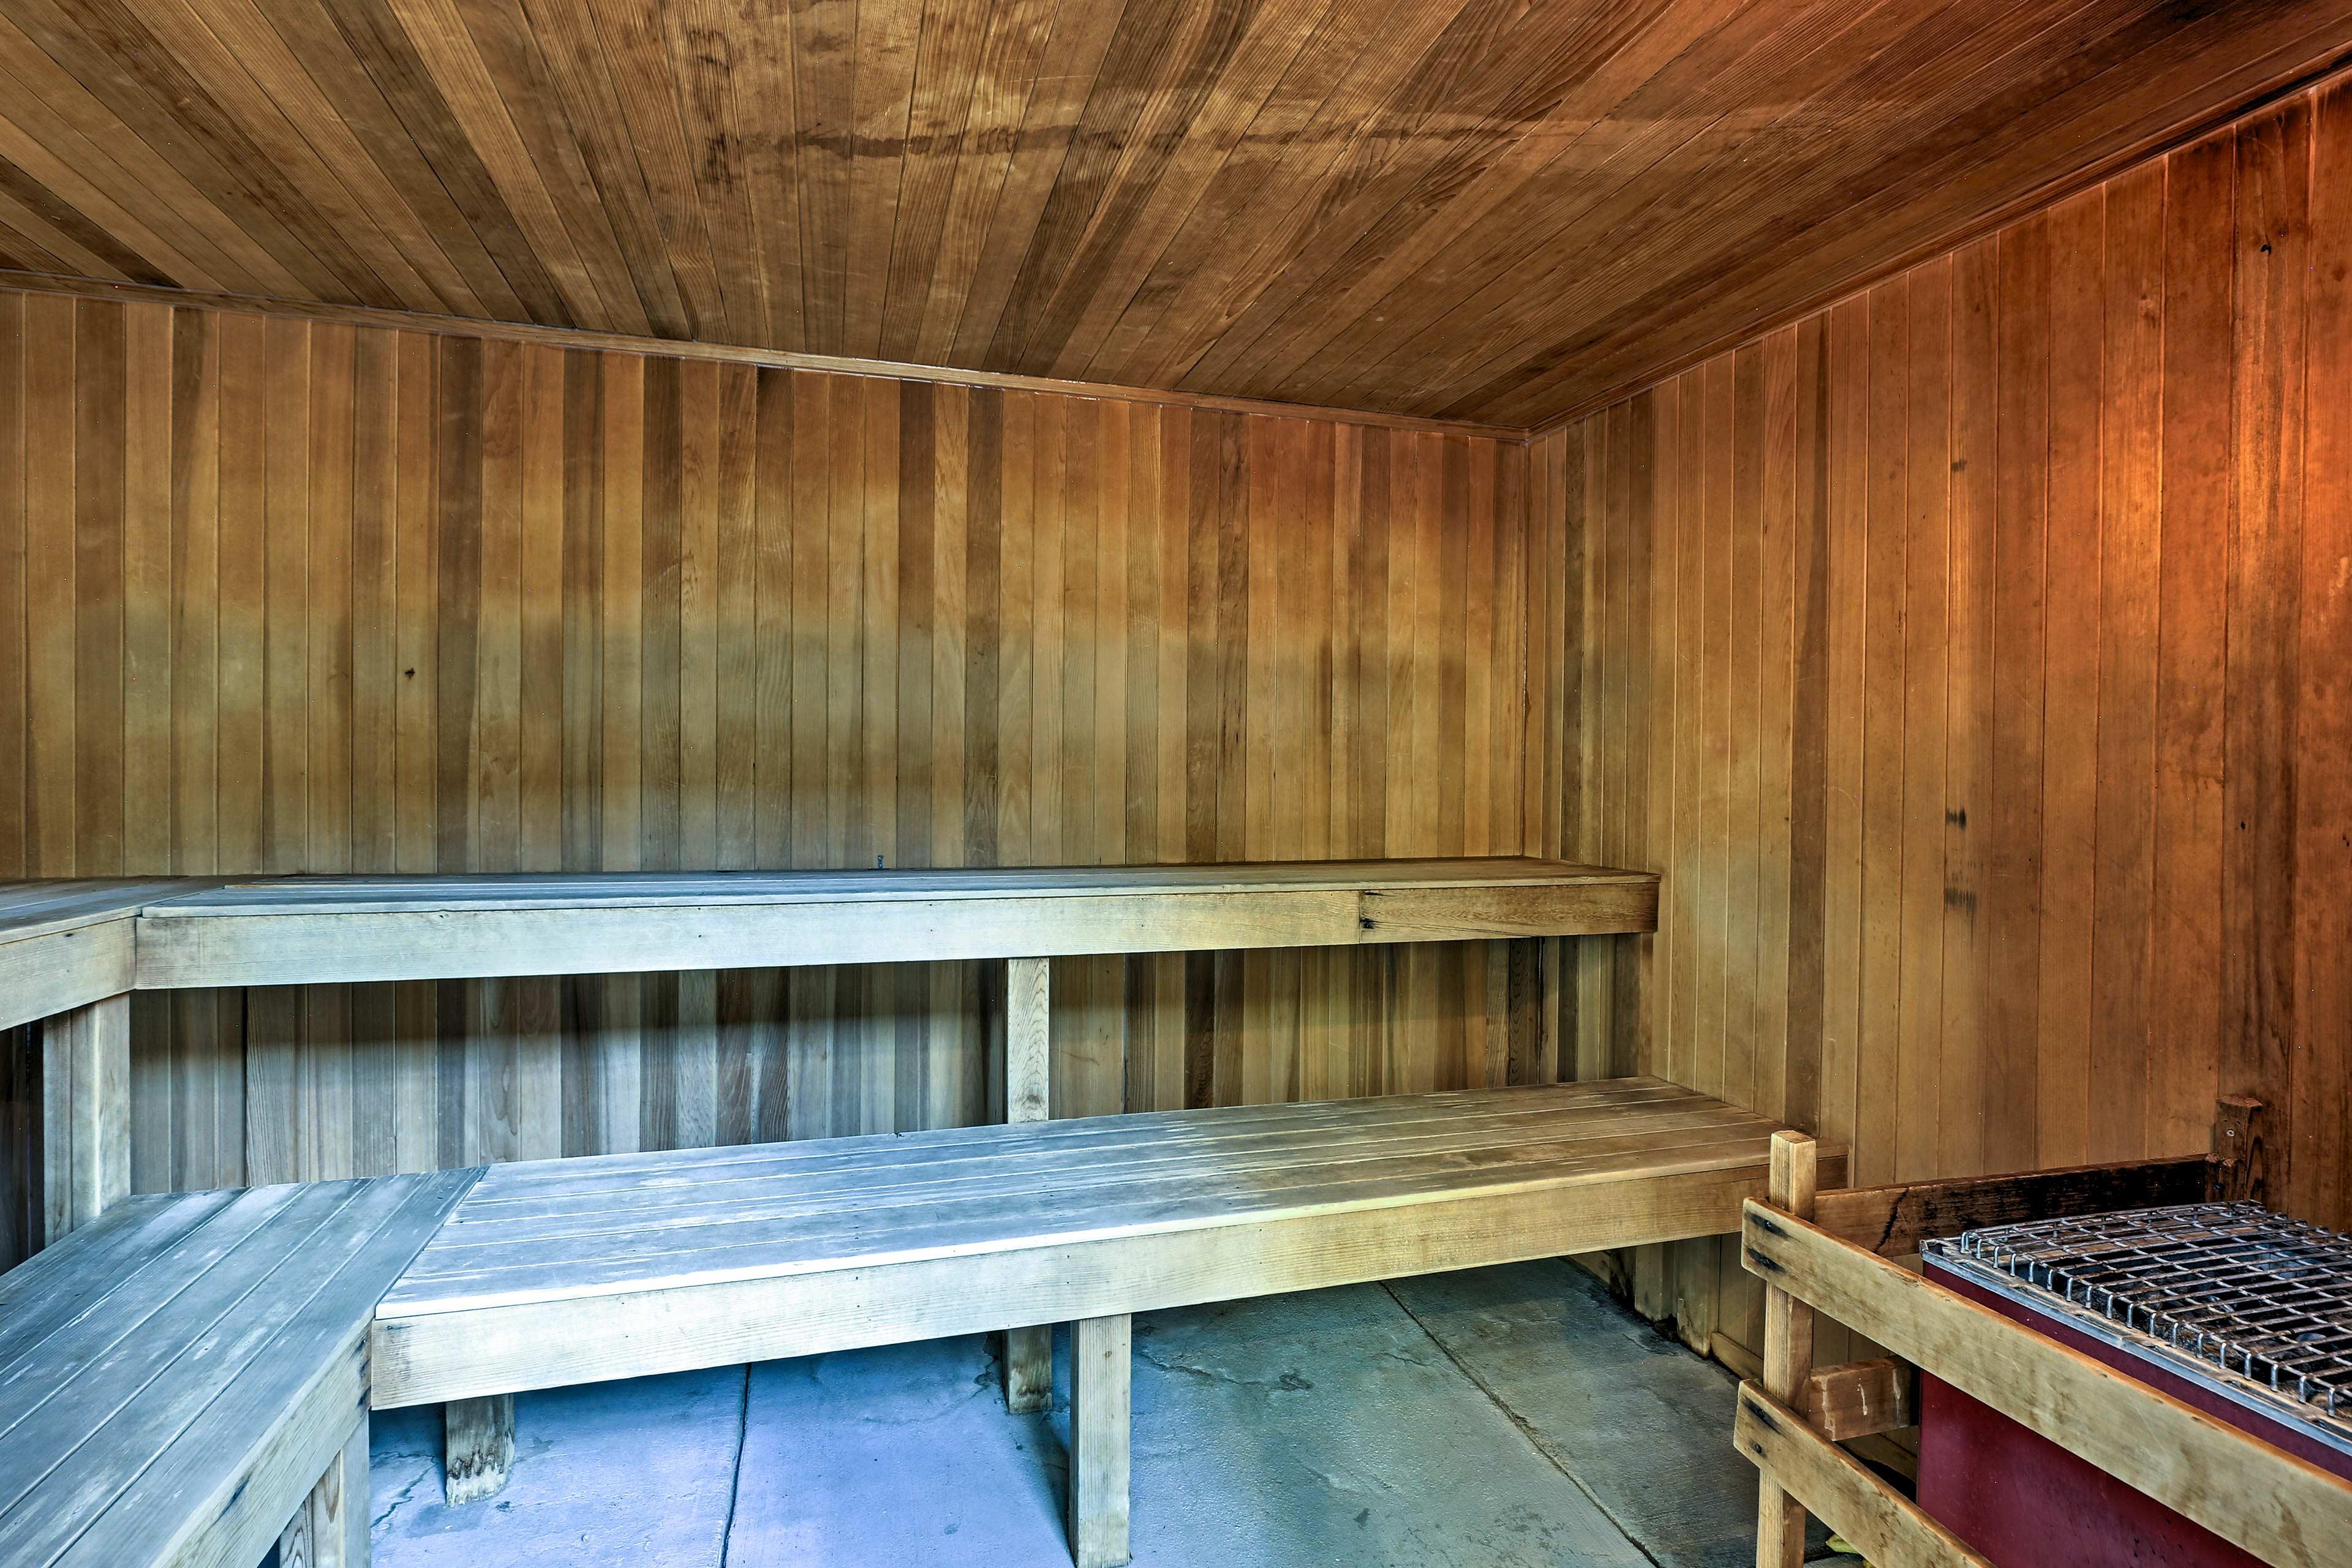 Detox your body in the sauna.